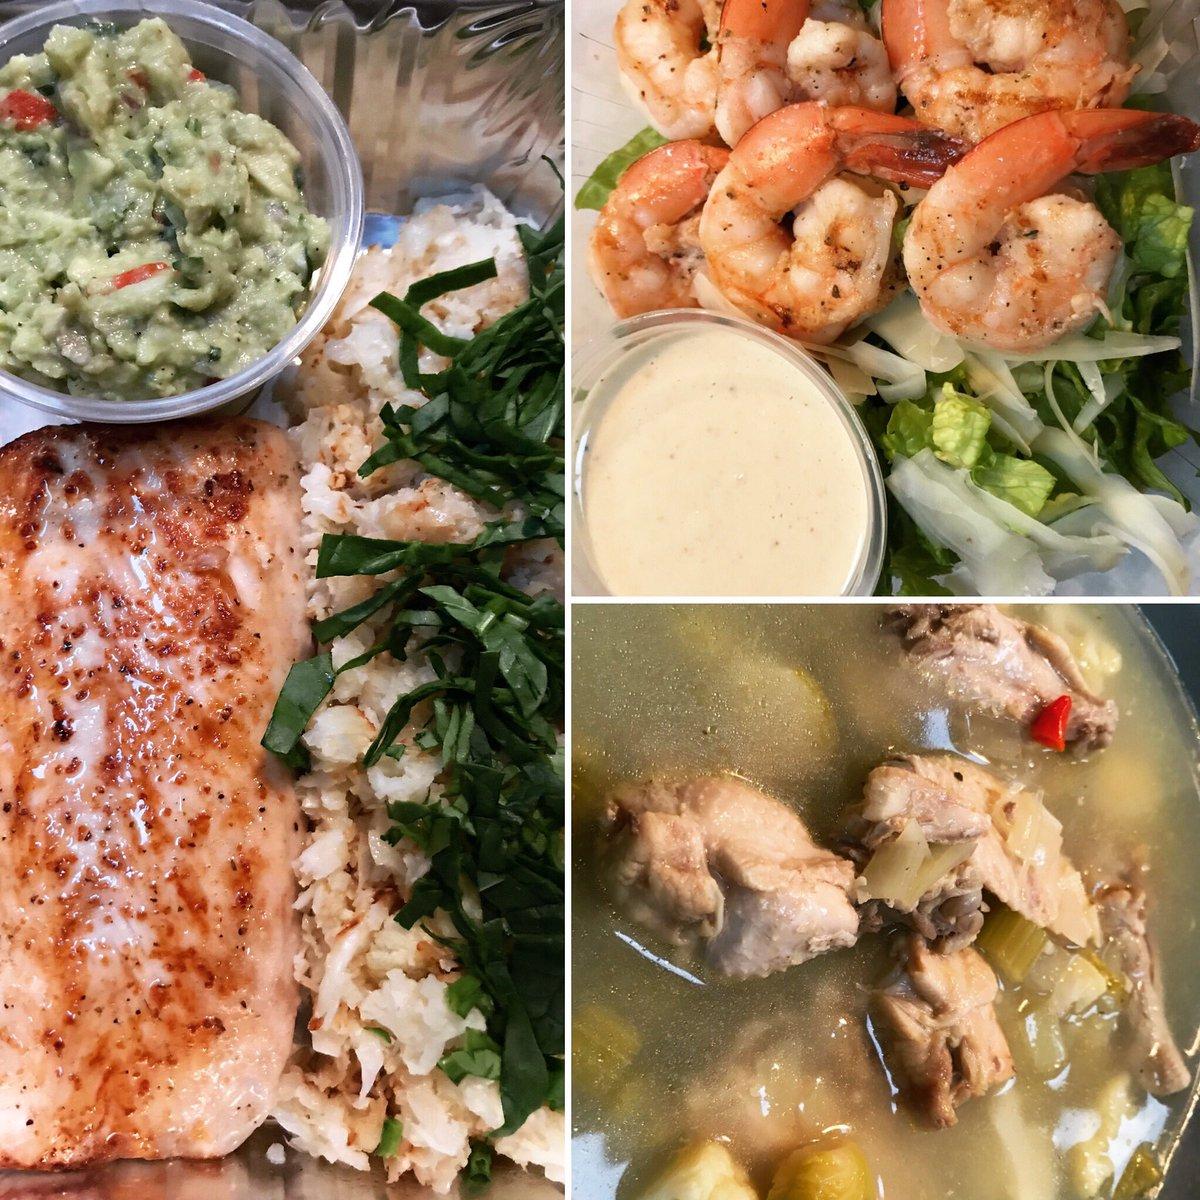 Tuesday's Keto Meal Prep Keto Chicken Souse Grilled Shrimp Caesar Salad w/ House Made Caesar dressing  Pan Seared Mahi Mahi w/ Cauliflower Rice & Guacamole  #DunmoreDeliByChefNiki #Keto #WeDoKeto<br>http://pic.twitter.com/8dCyEWNjQ2